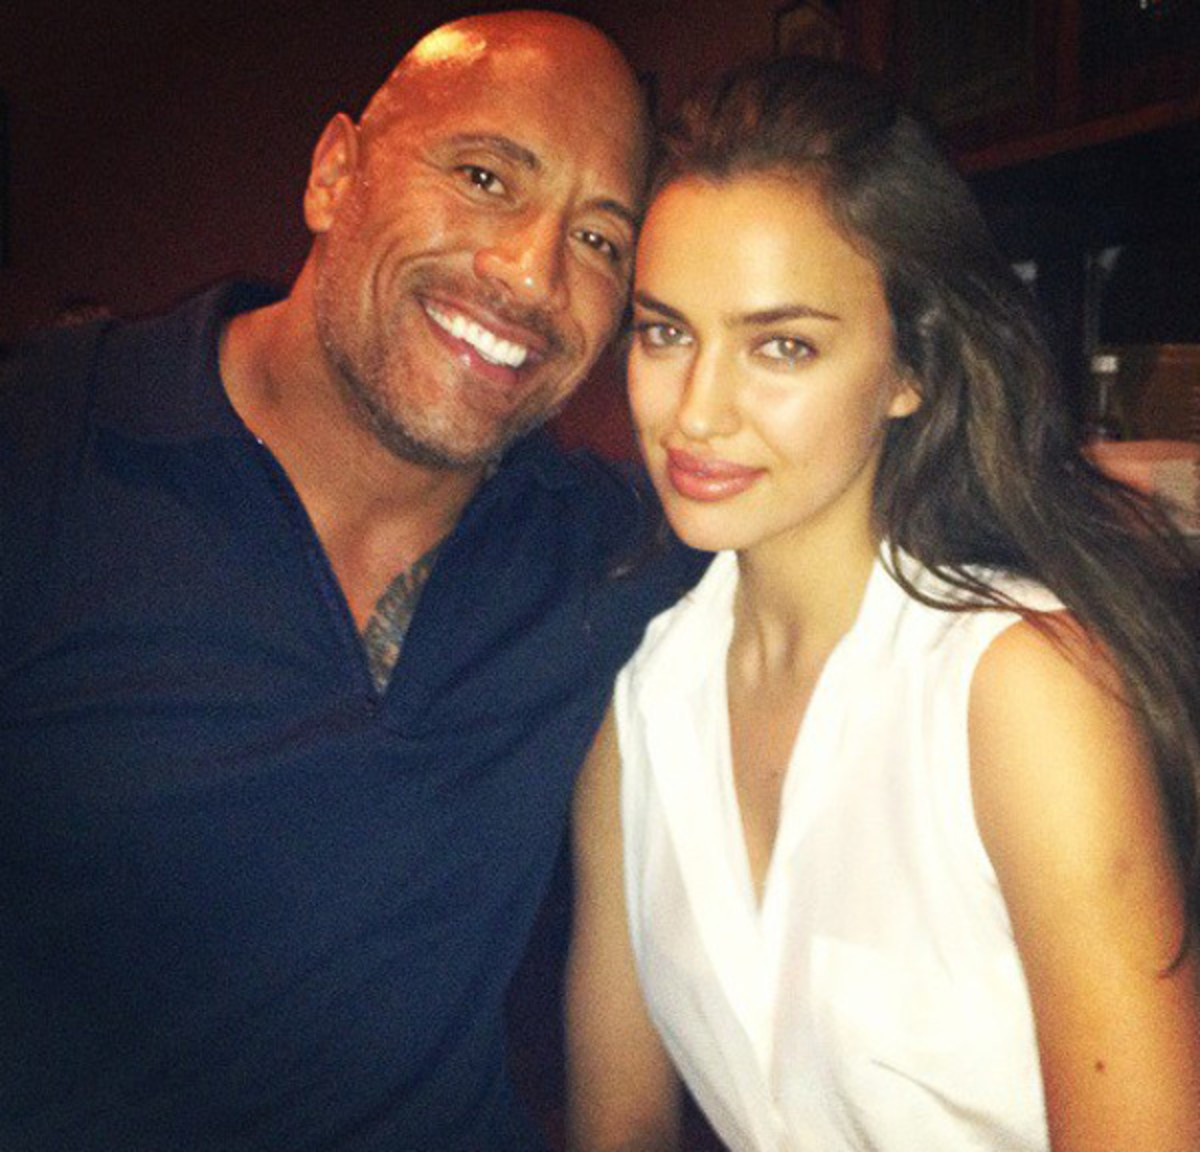 The Rock and Irina Shayk :: @irinashaykofficial